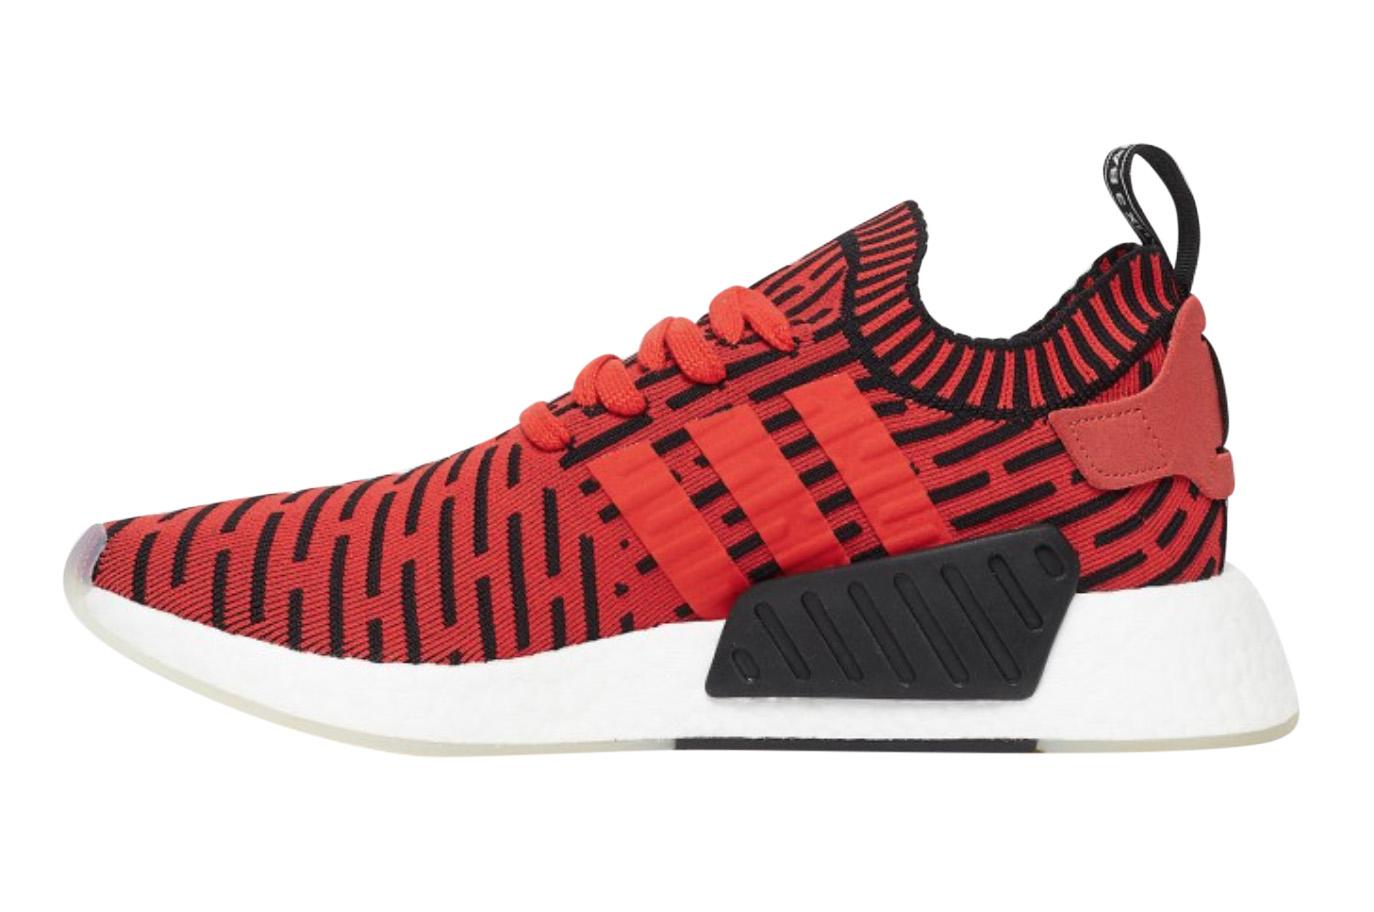 adidas NMD R2 Core Red Black - KicksOnFire